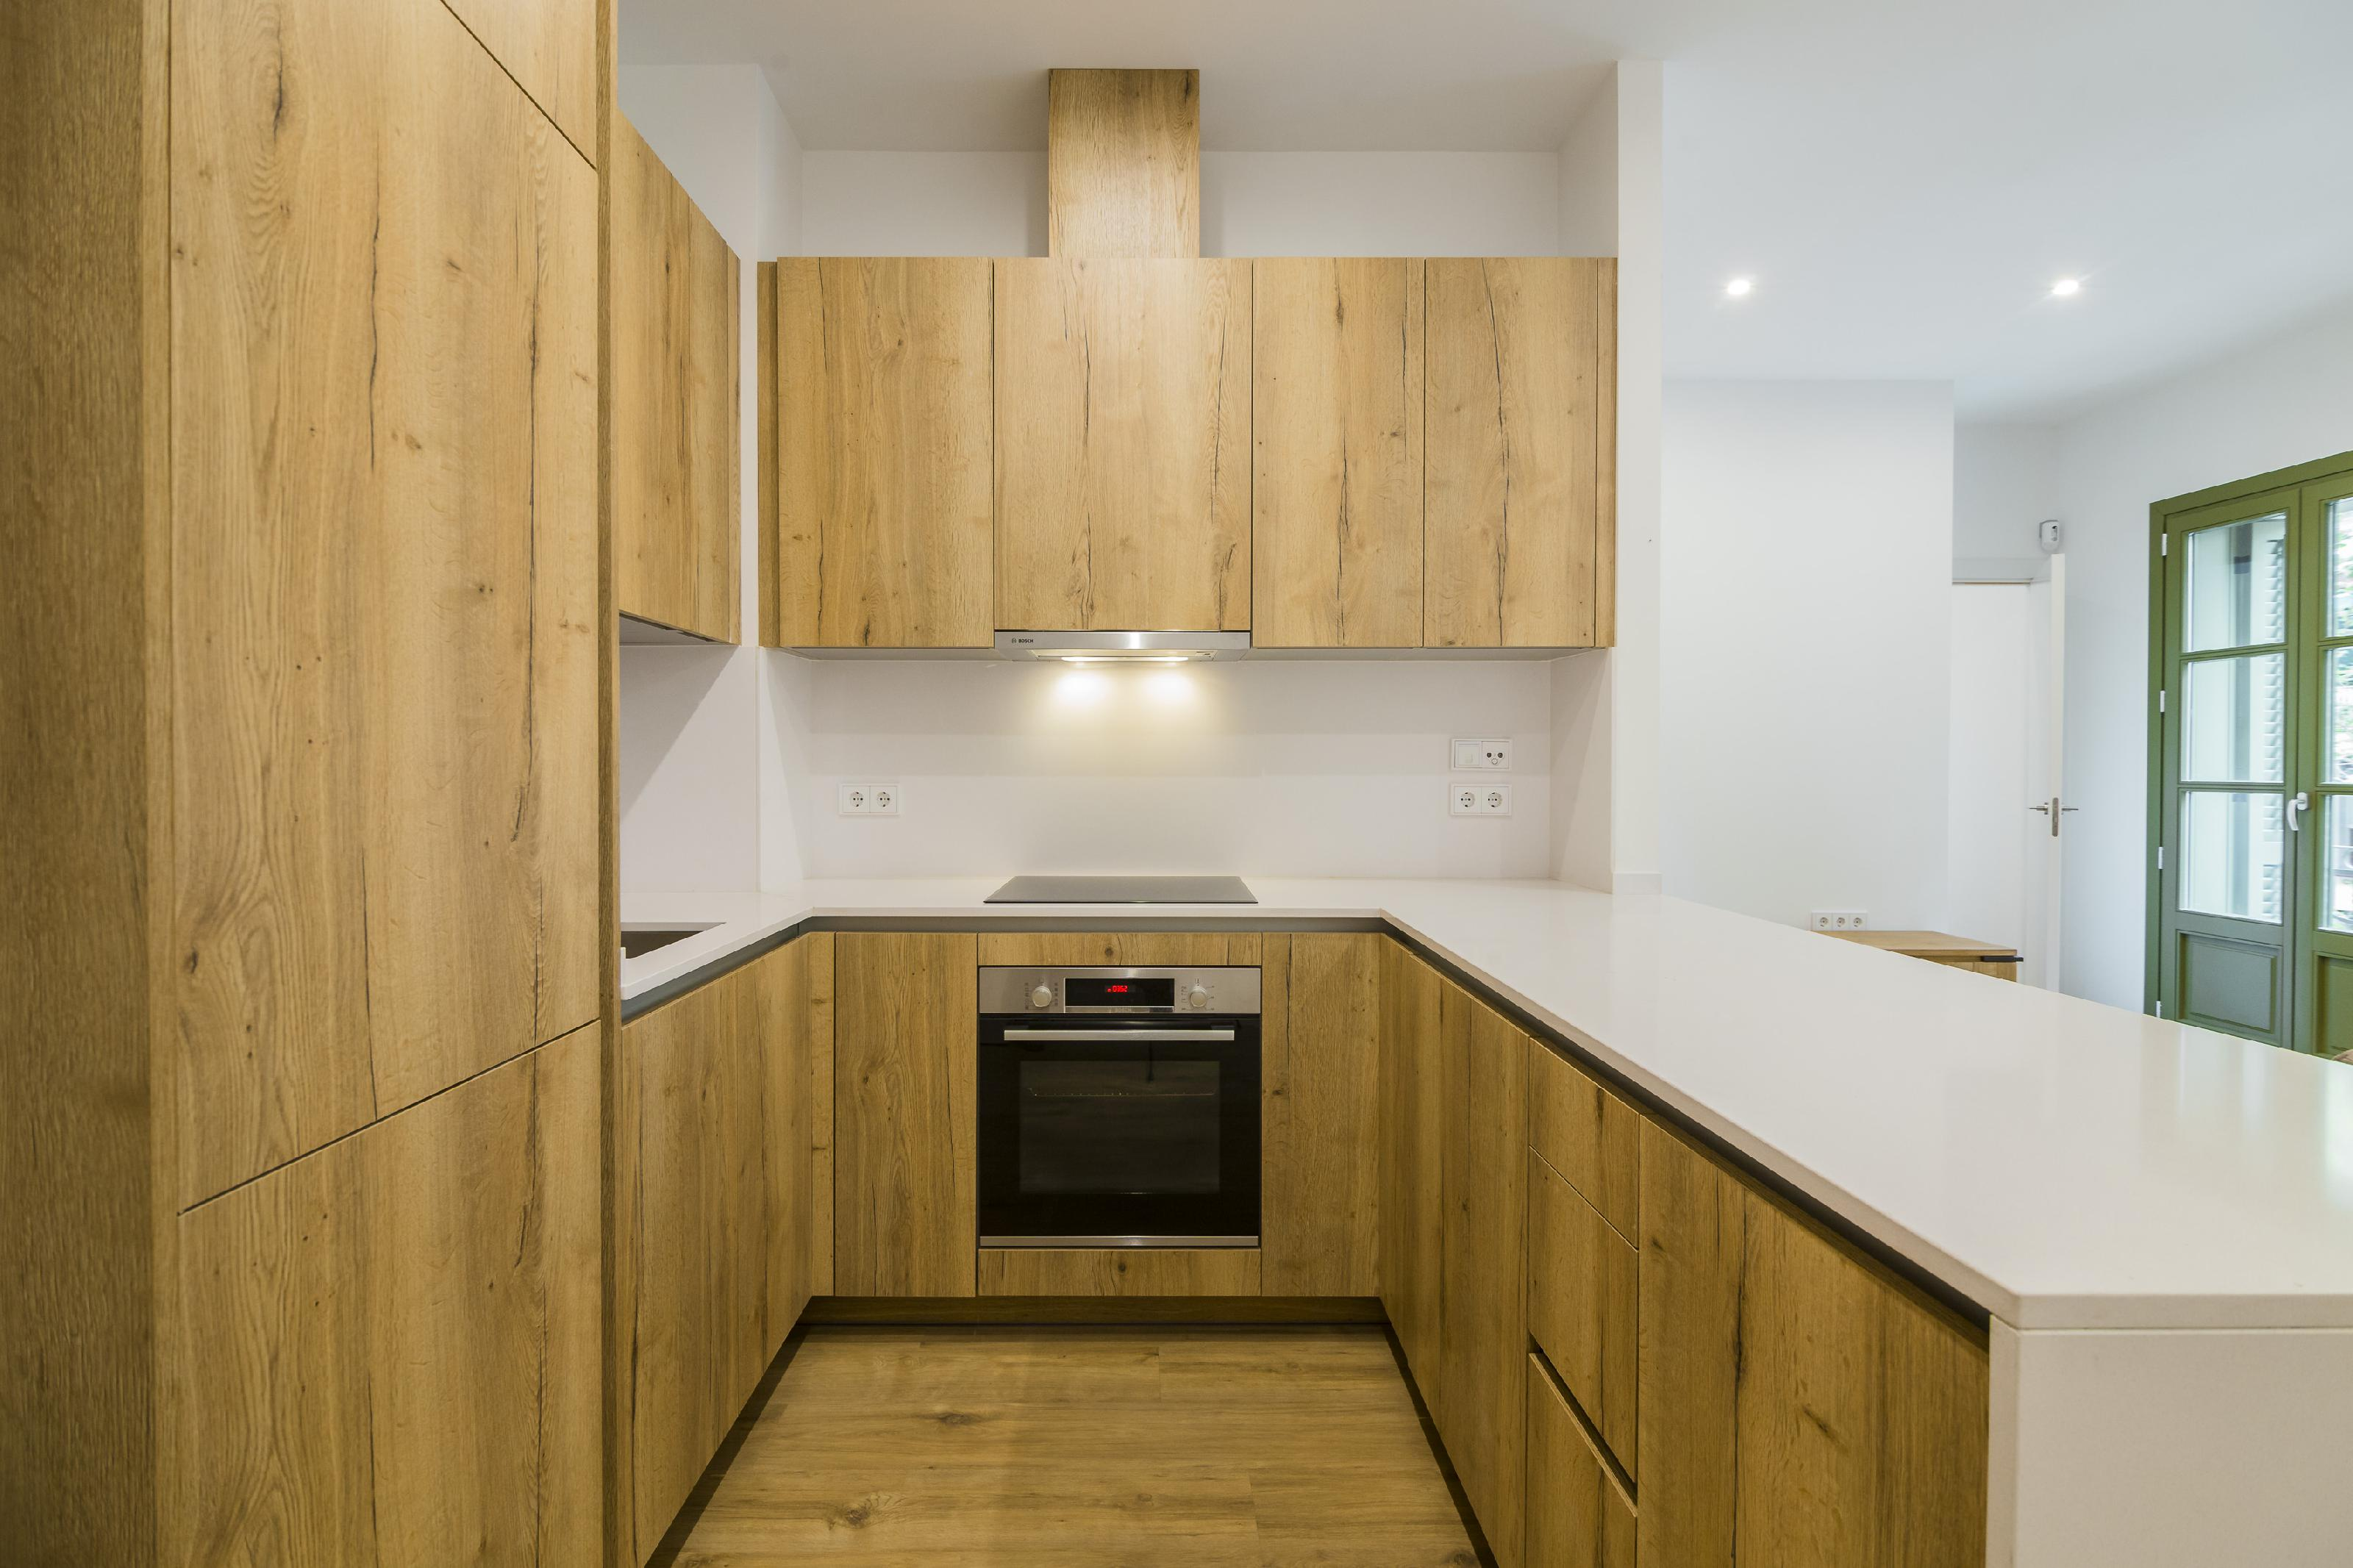 249266 Flat for sale in Eixample, Nova Esquerra Eixample 6